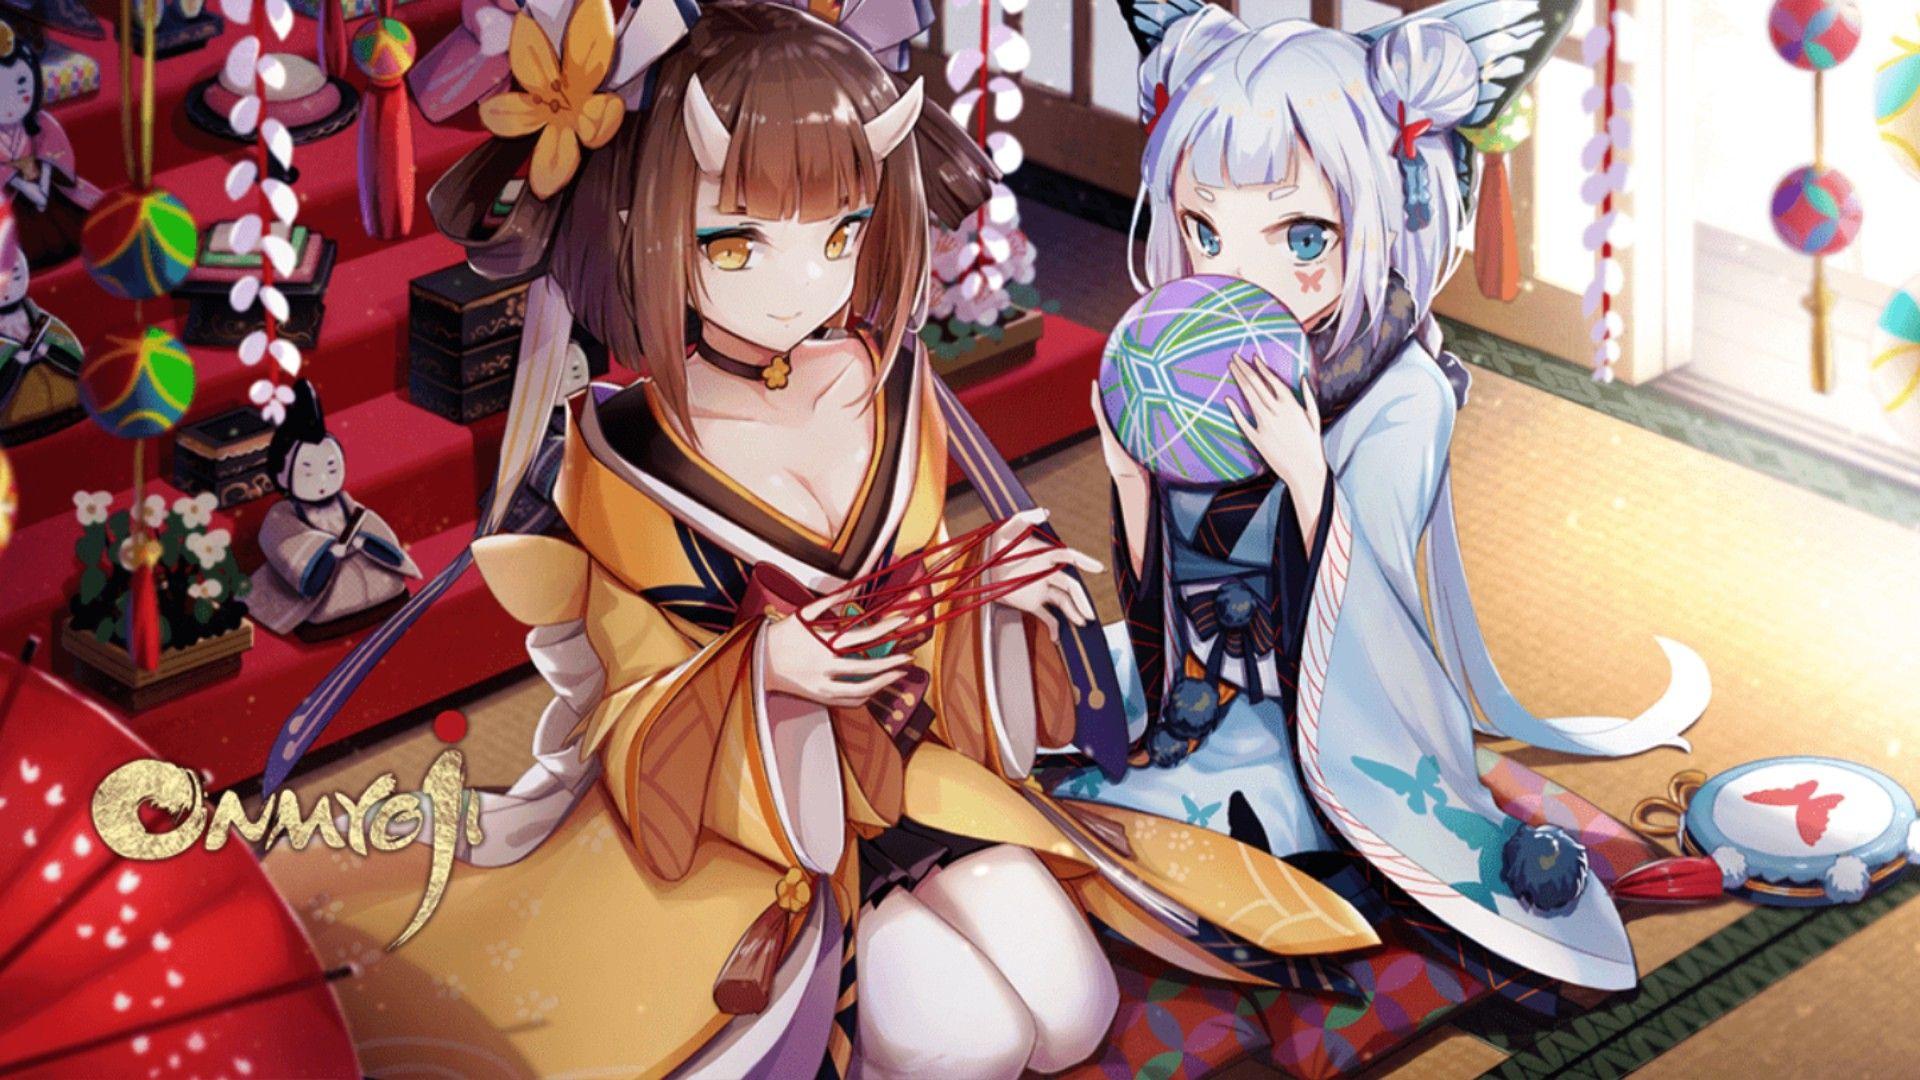 Pin oleh KouMazoku Sensei di onmyoji game